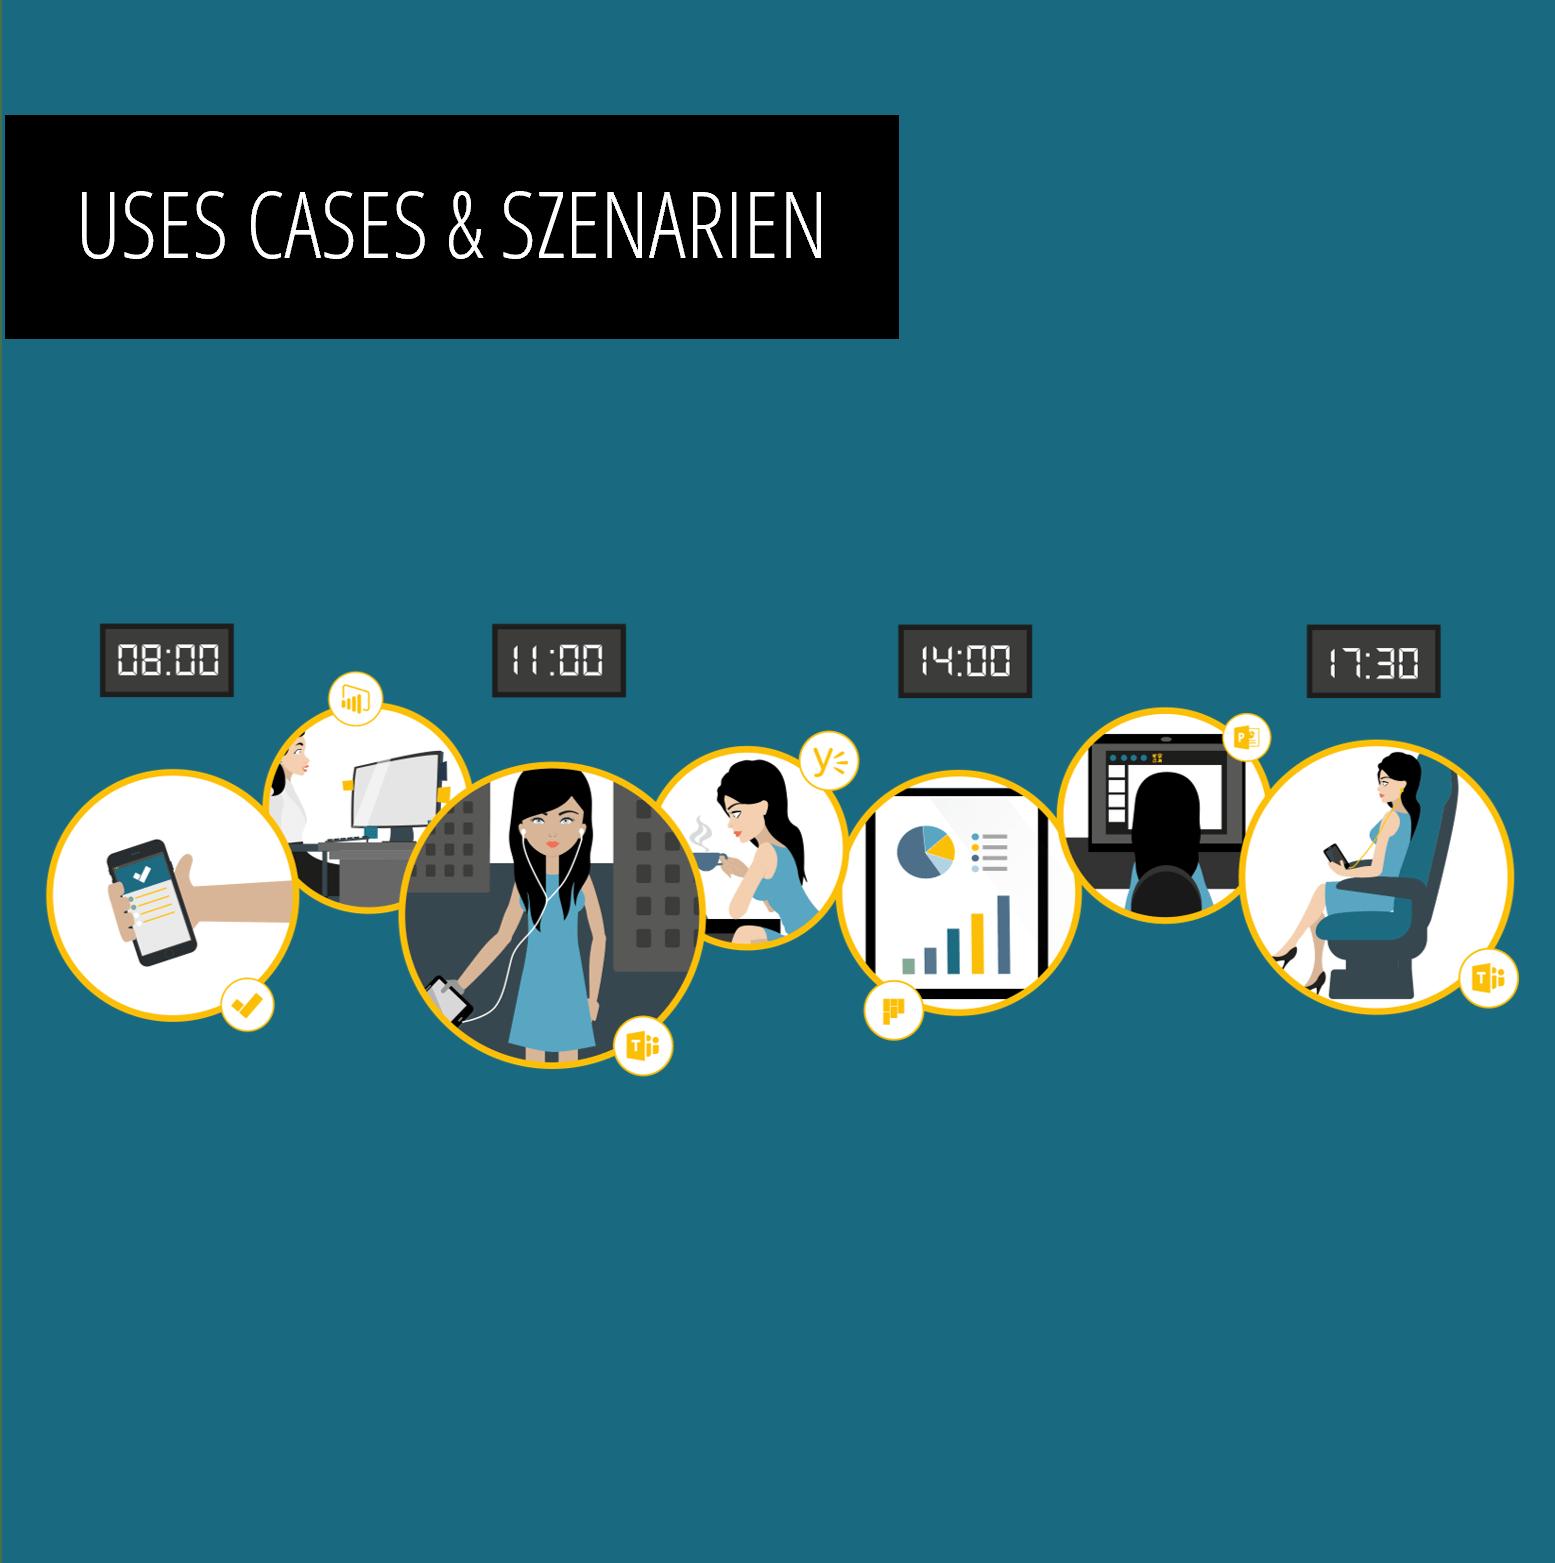 Uses Cases und Szenarien